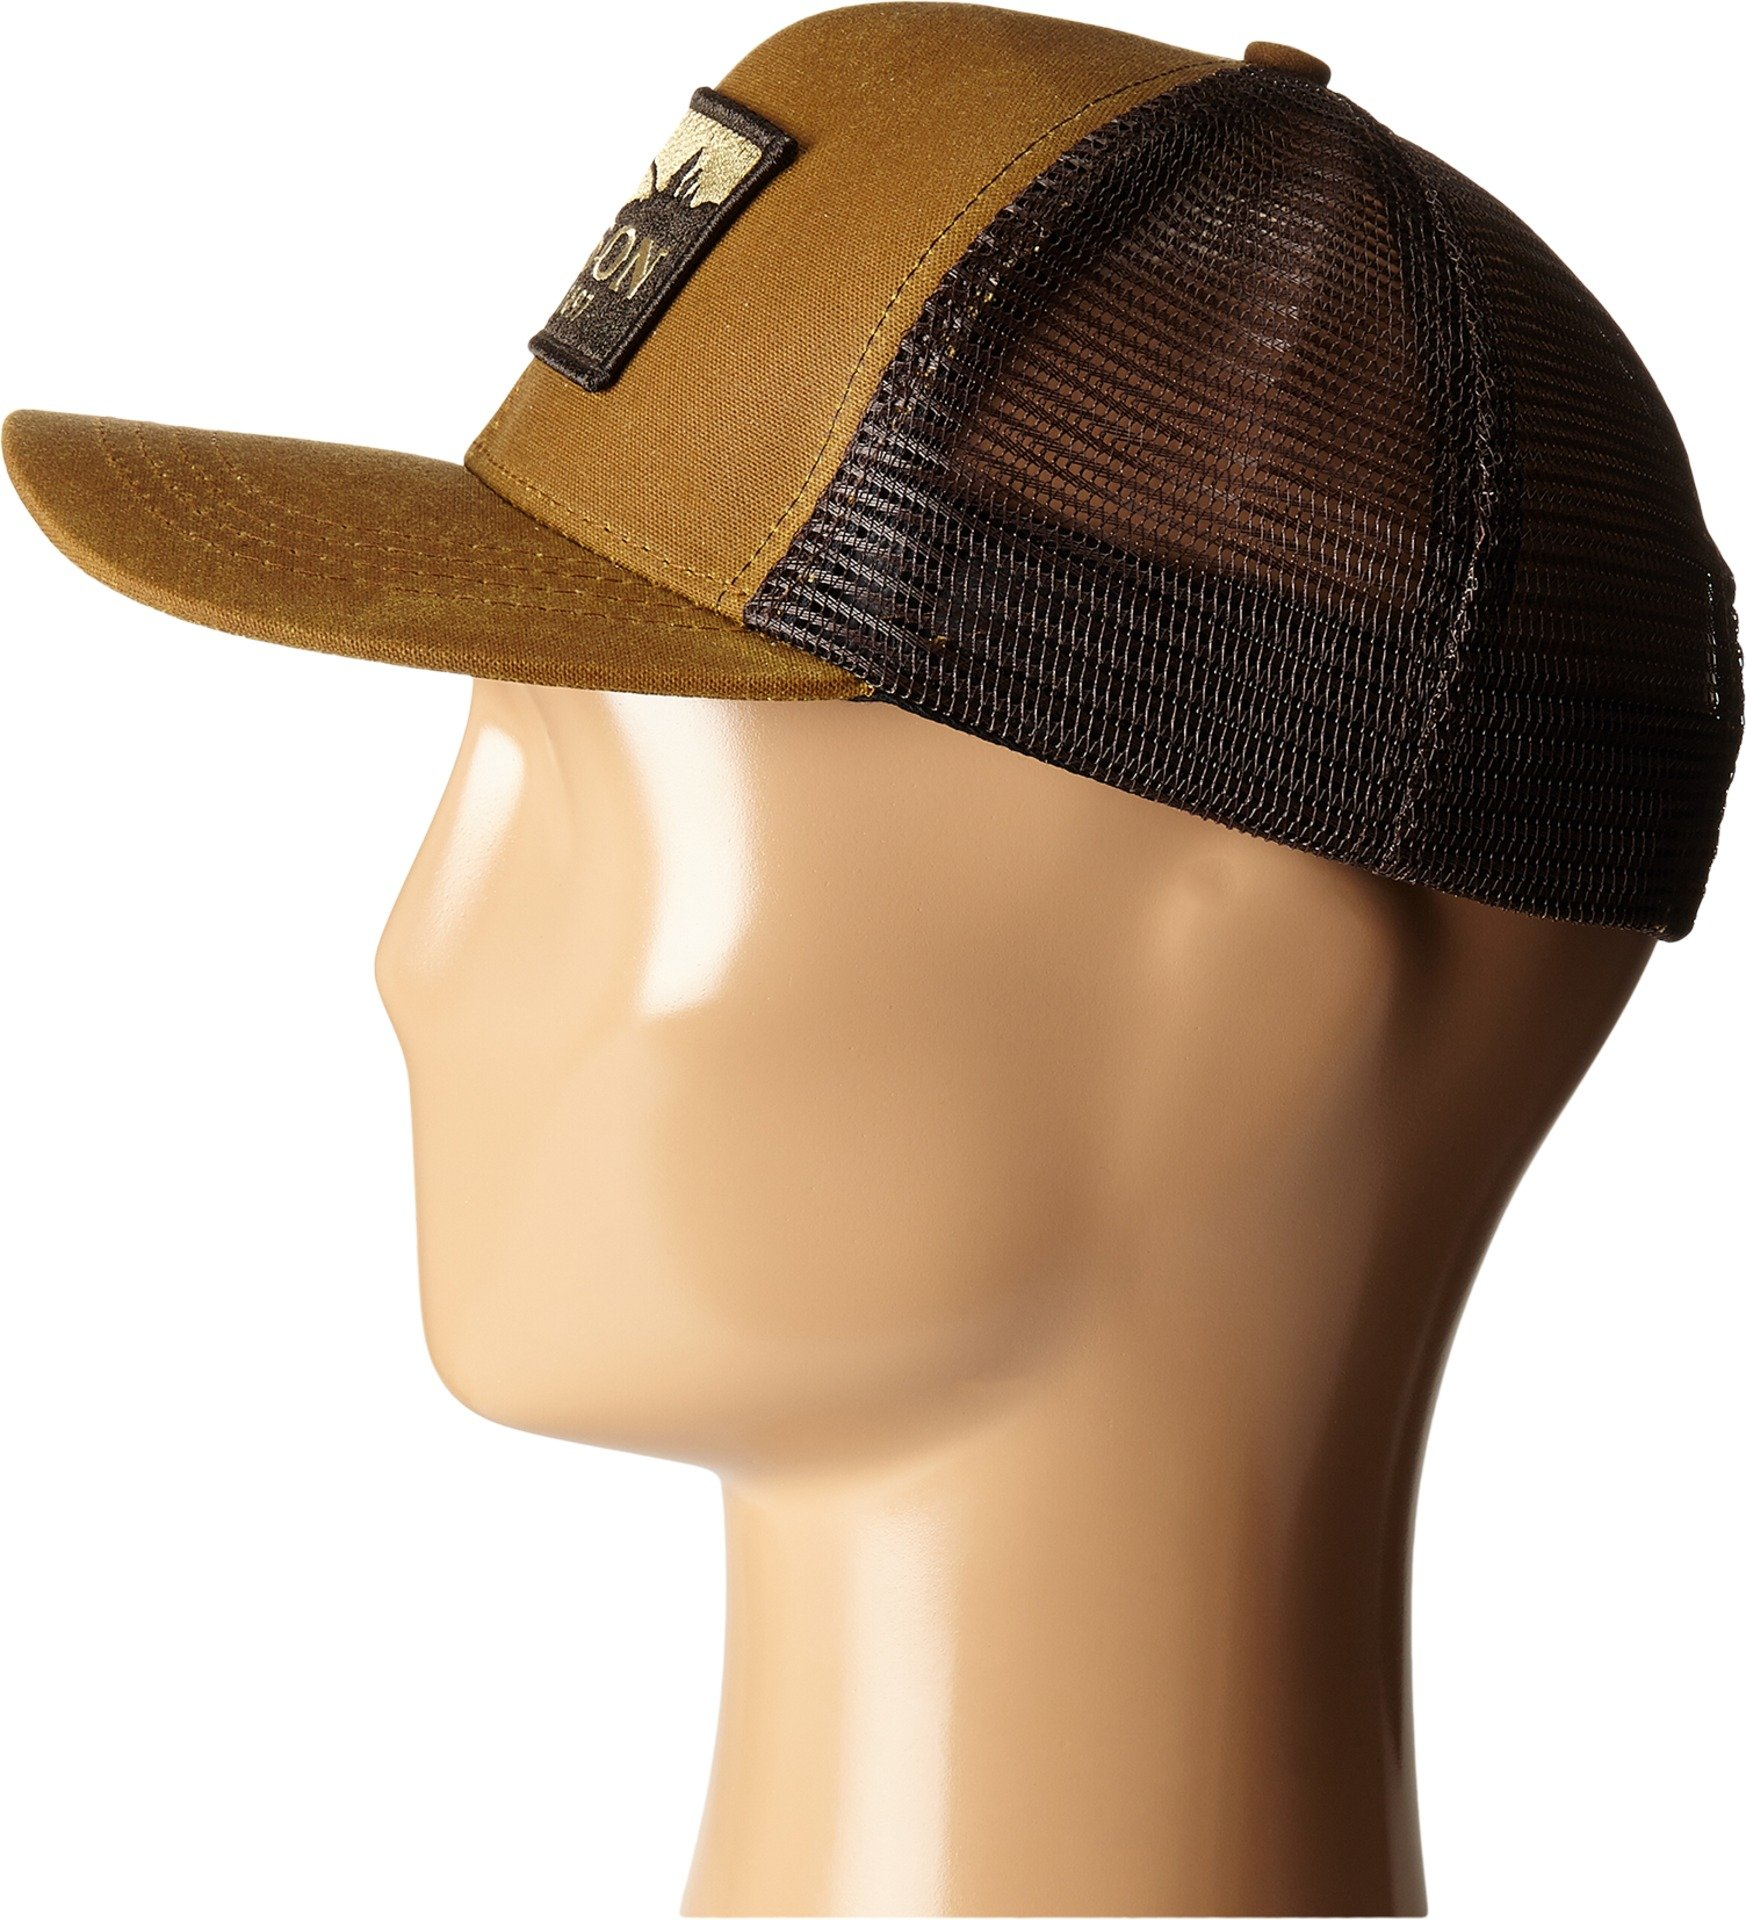 Filson Unisex Logger Mesh Cap Dark Tan Hat by Filson (Image #2)